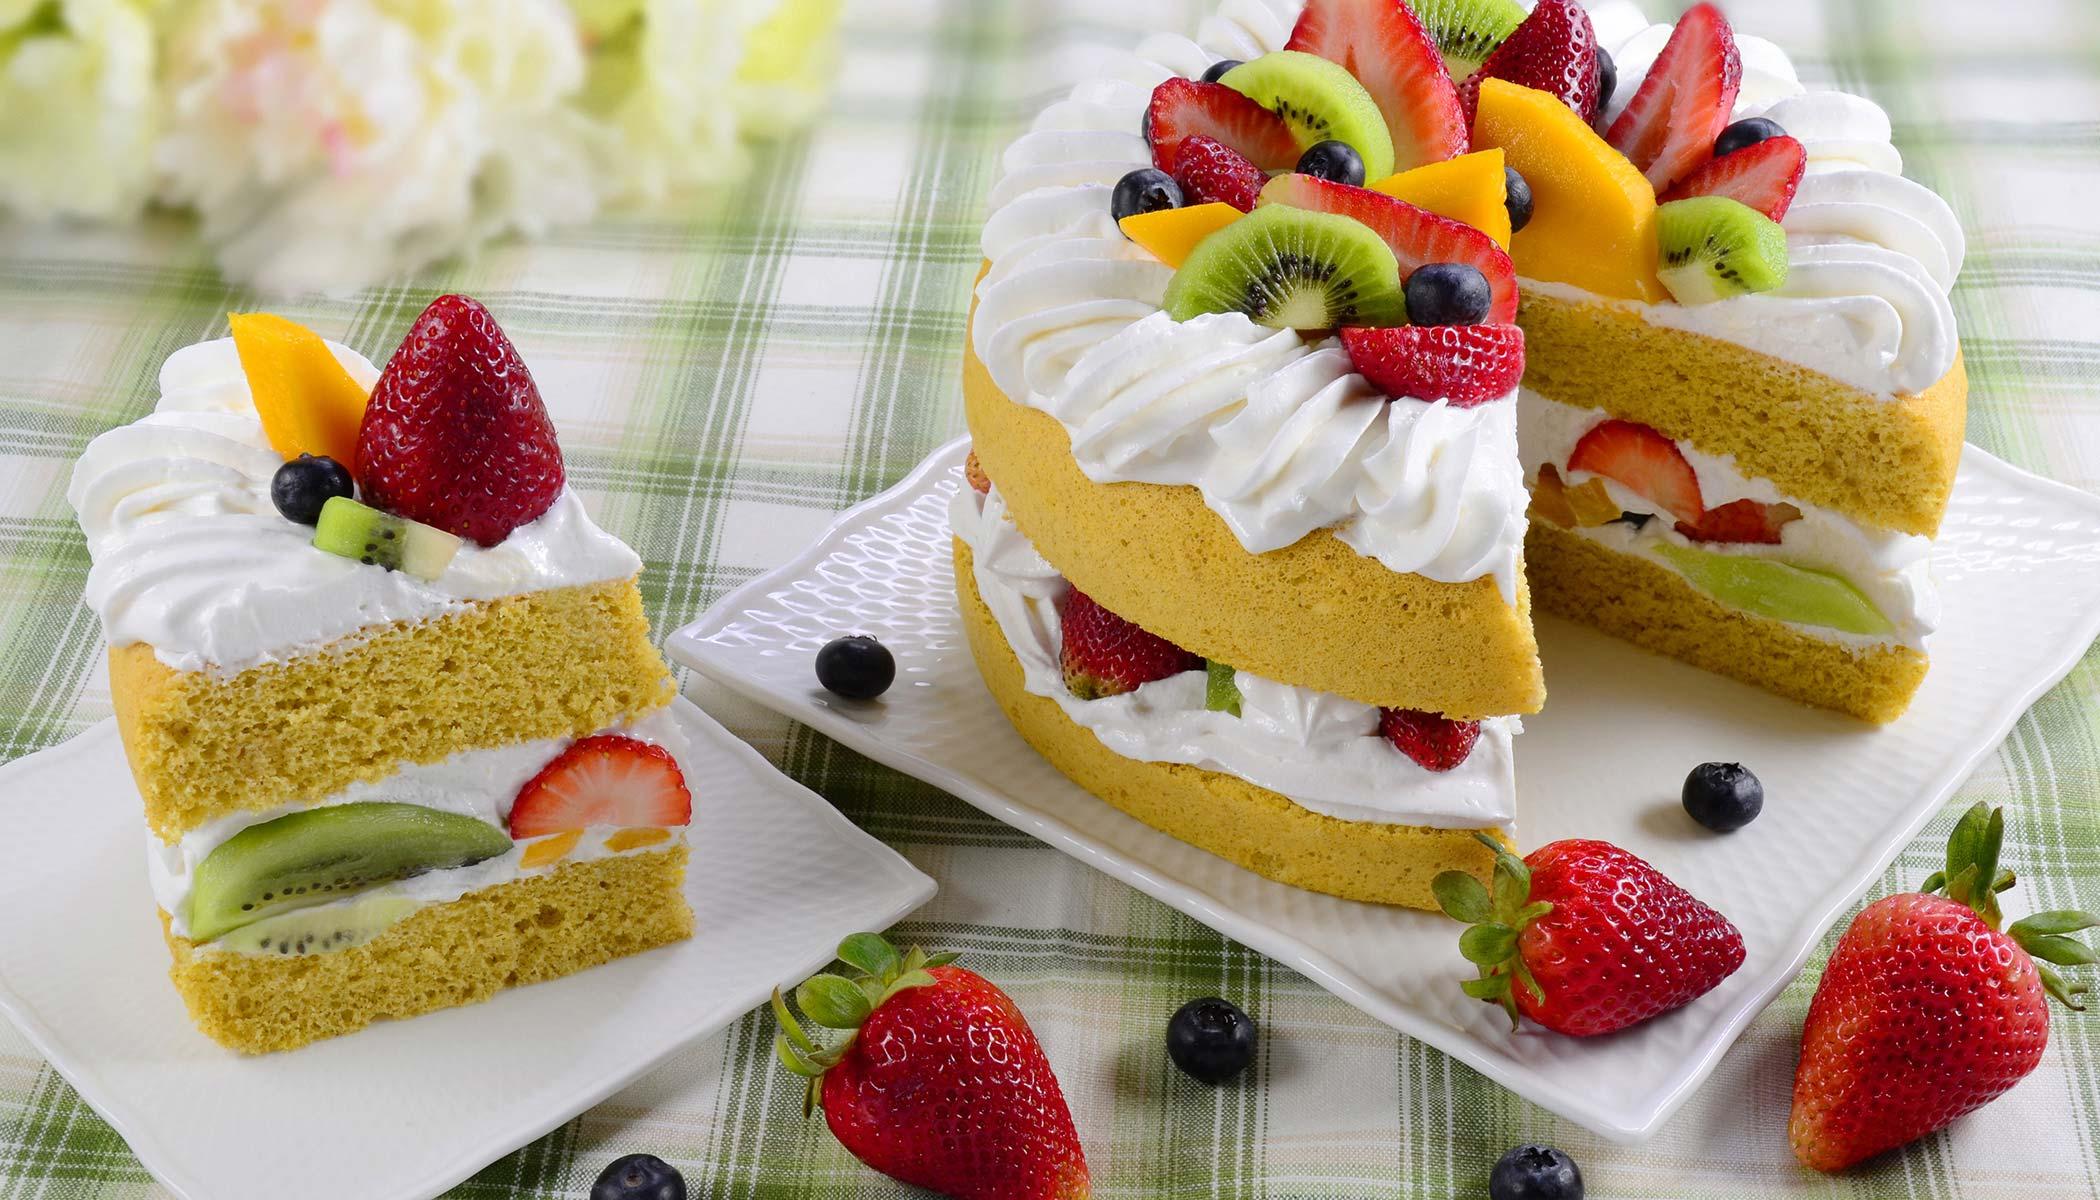 Whole Wheat Sponge Cake